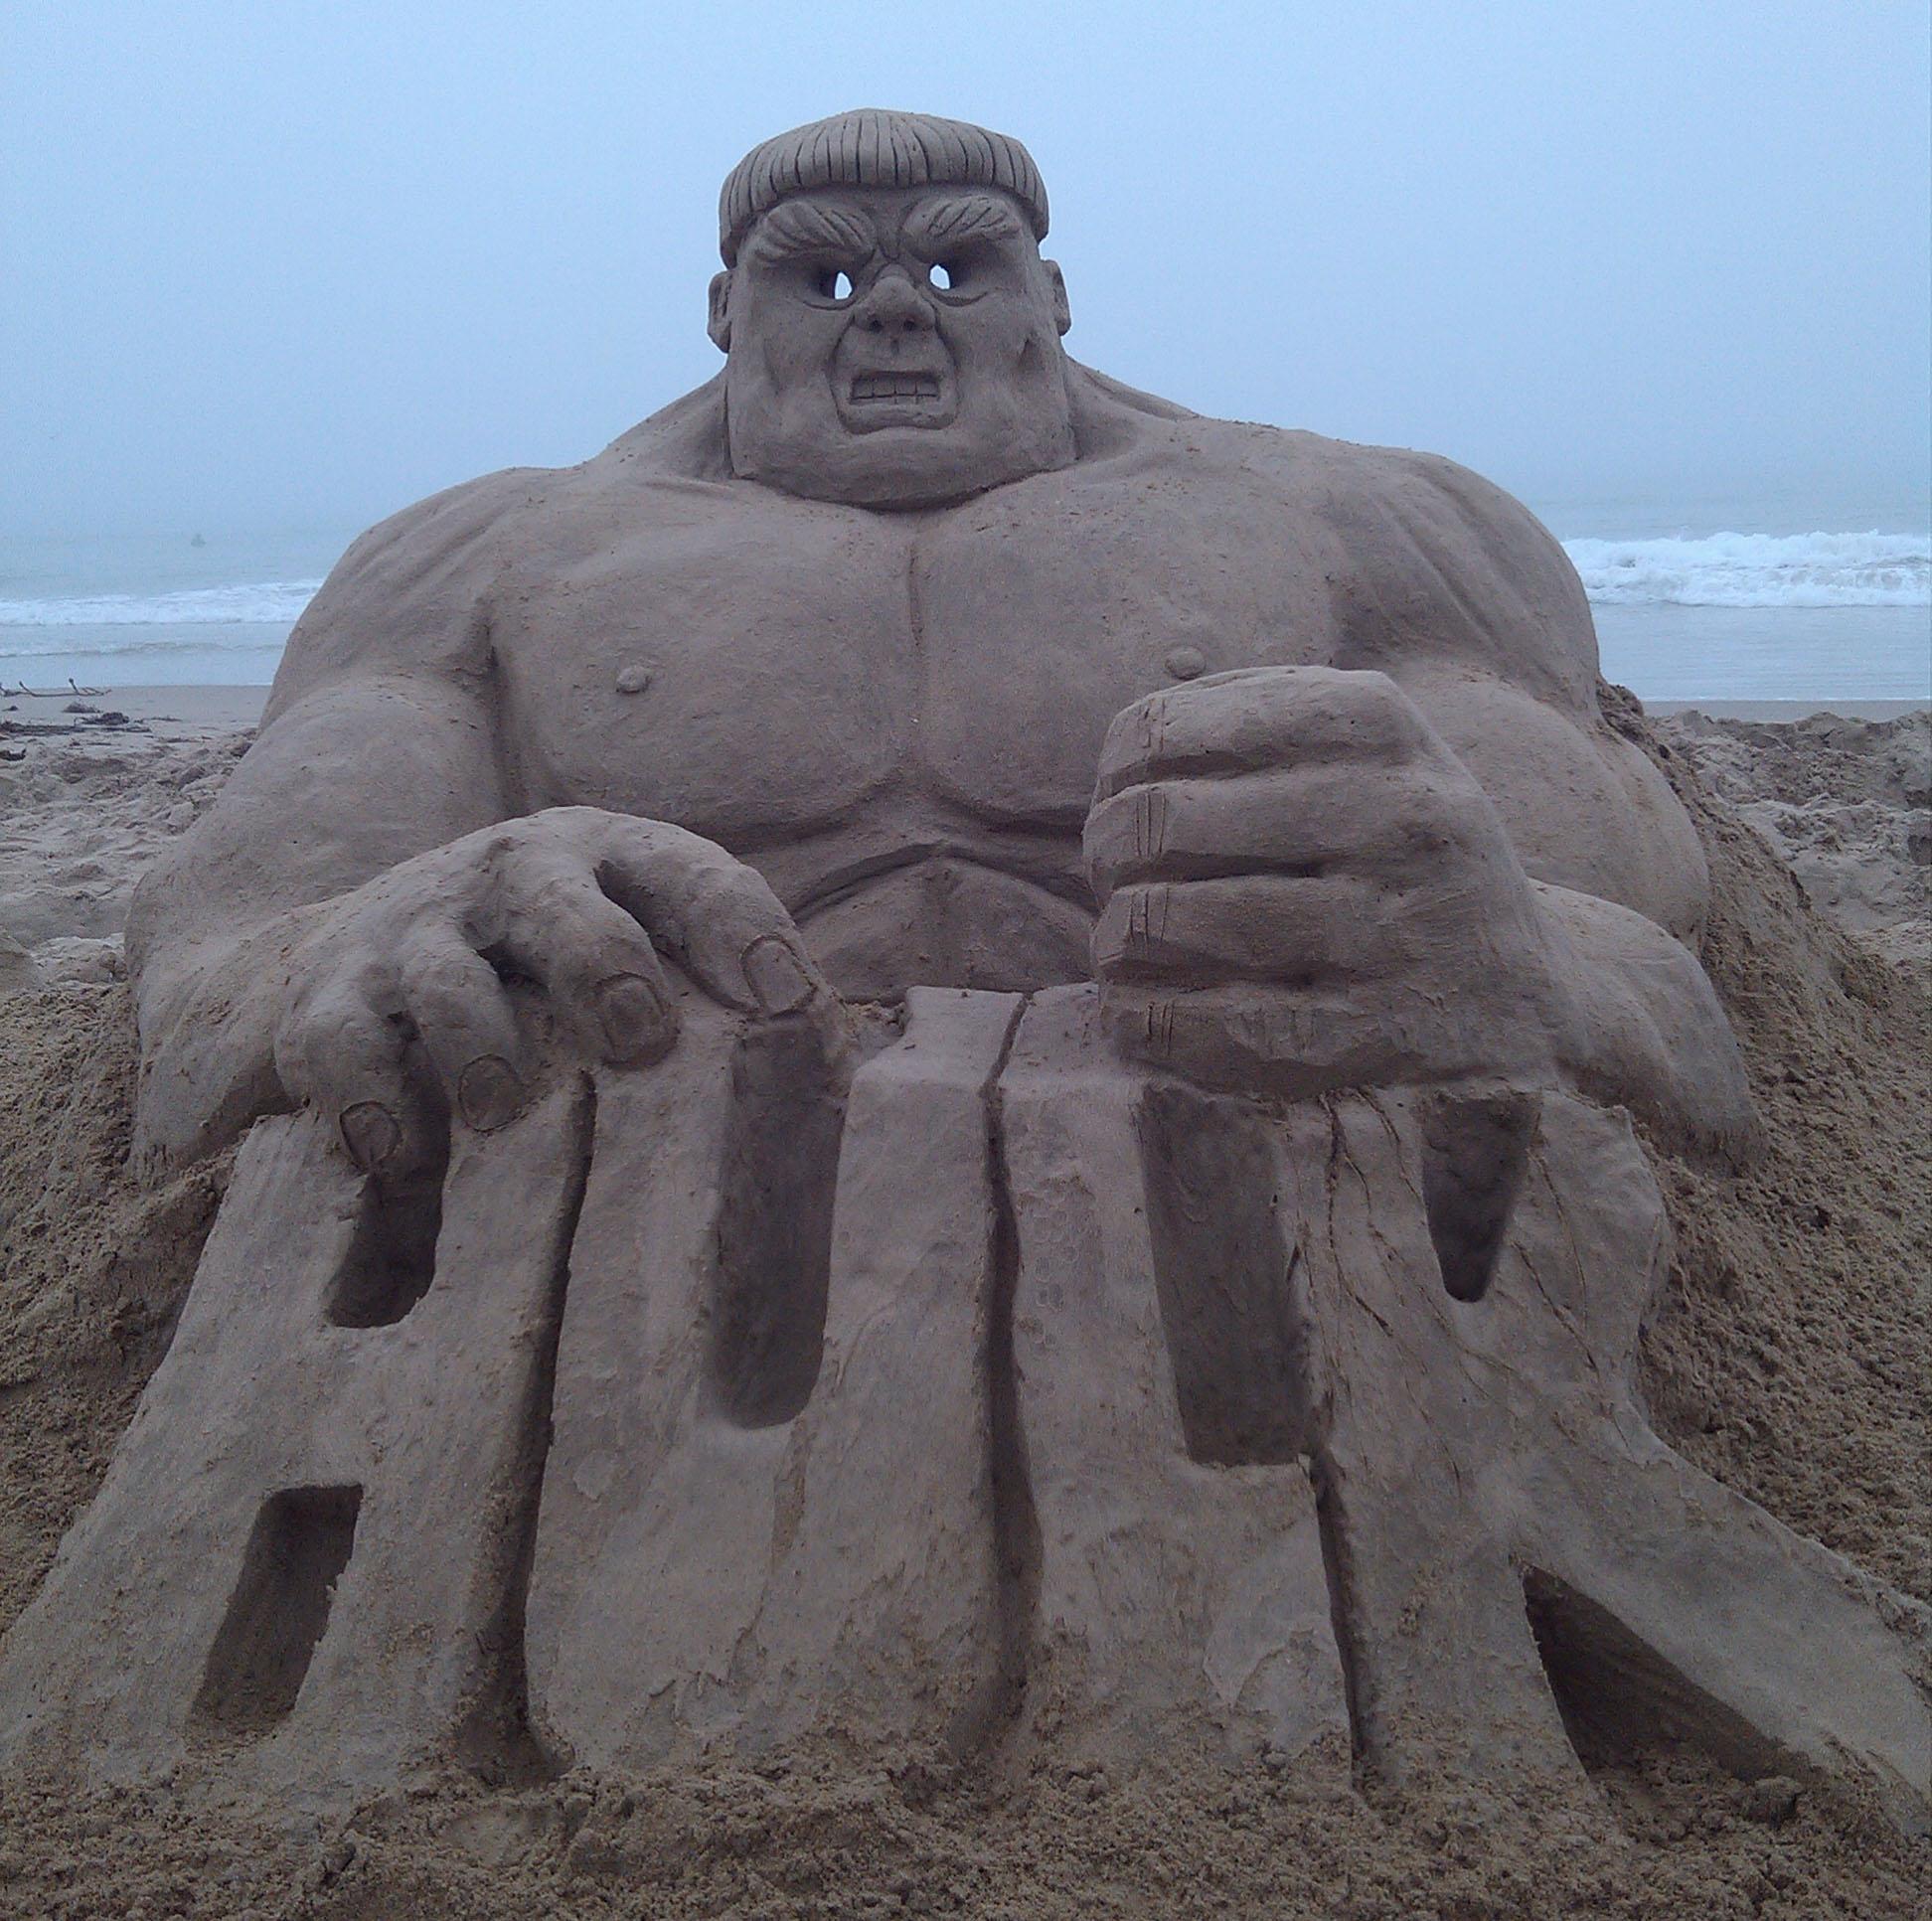 Sand Sculptures - Phil Singer Art Studios